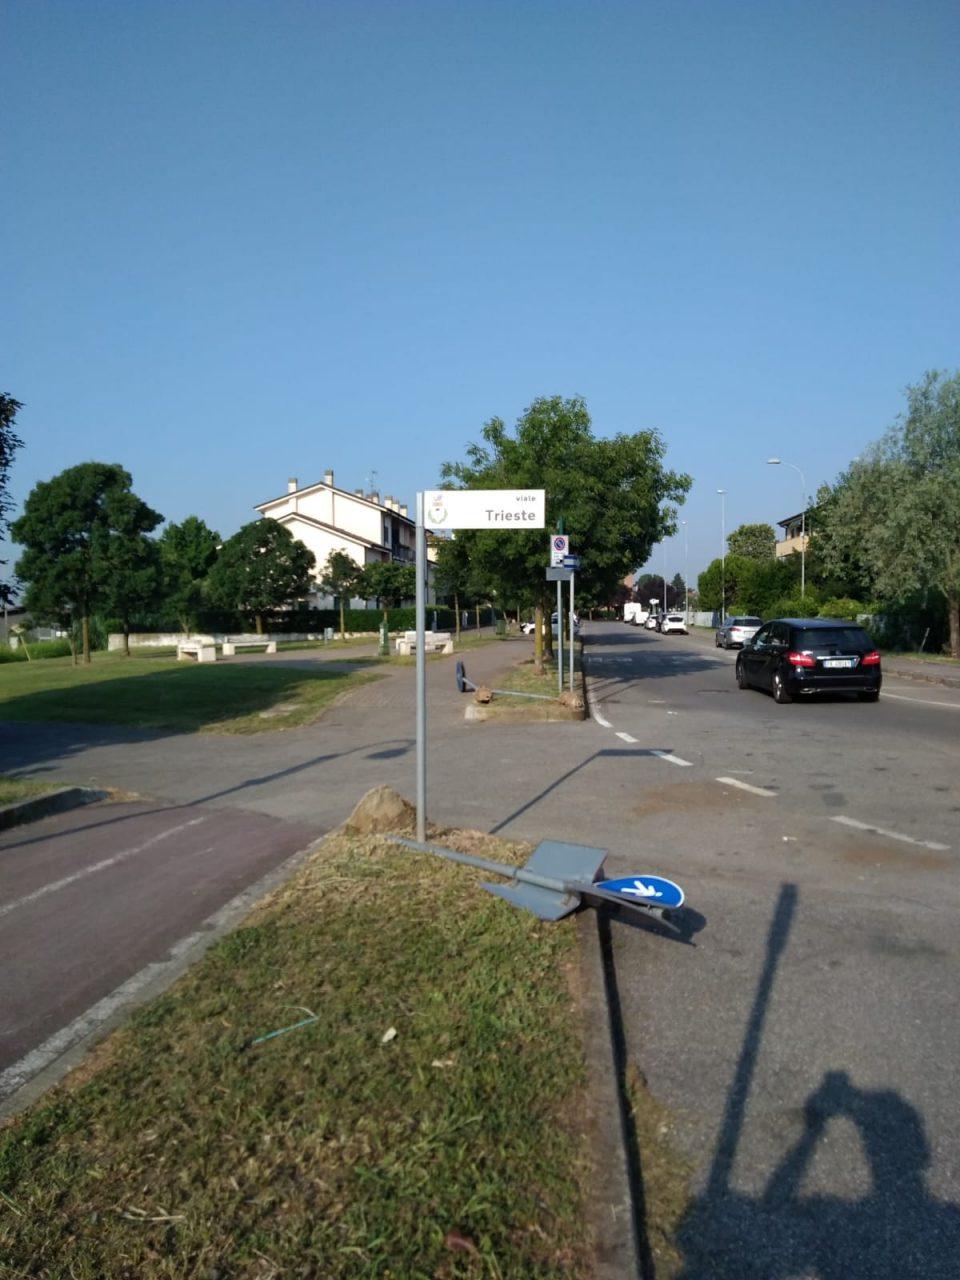 Raid vandalico a cassina de pecchi via trieste abbattuti i cartelli stradali